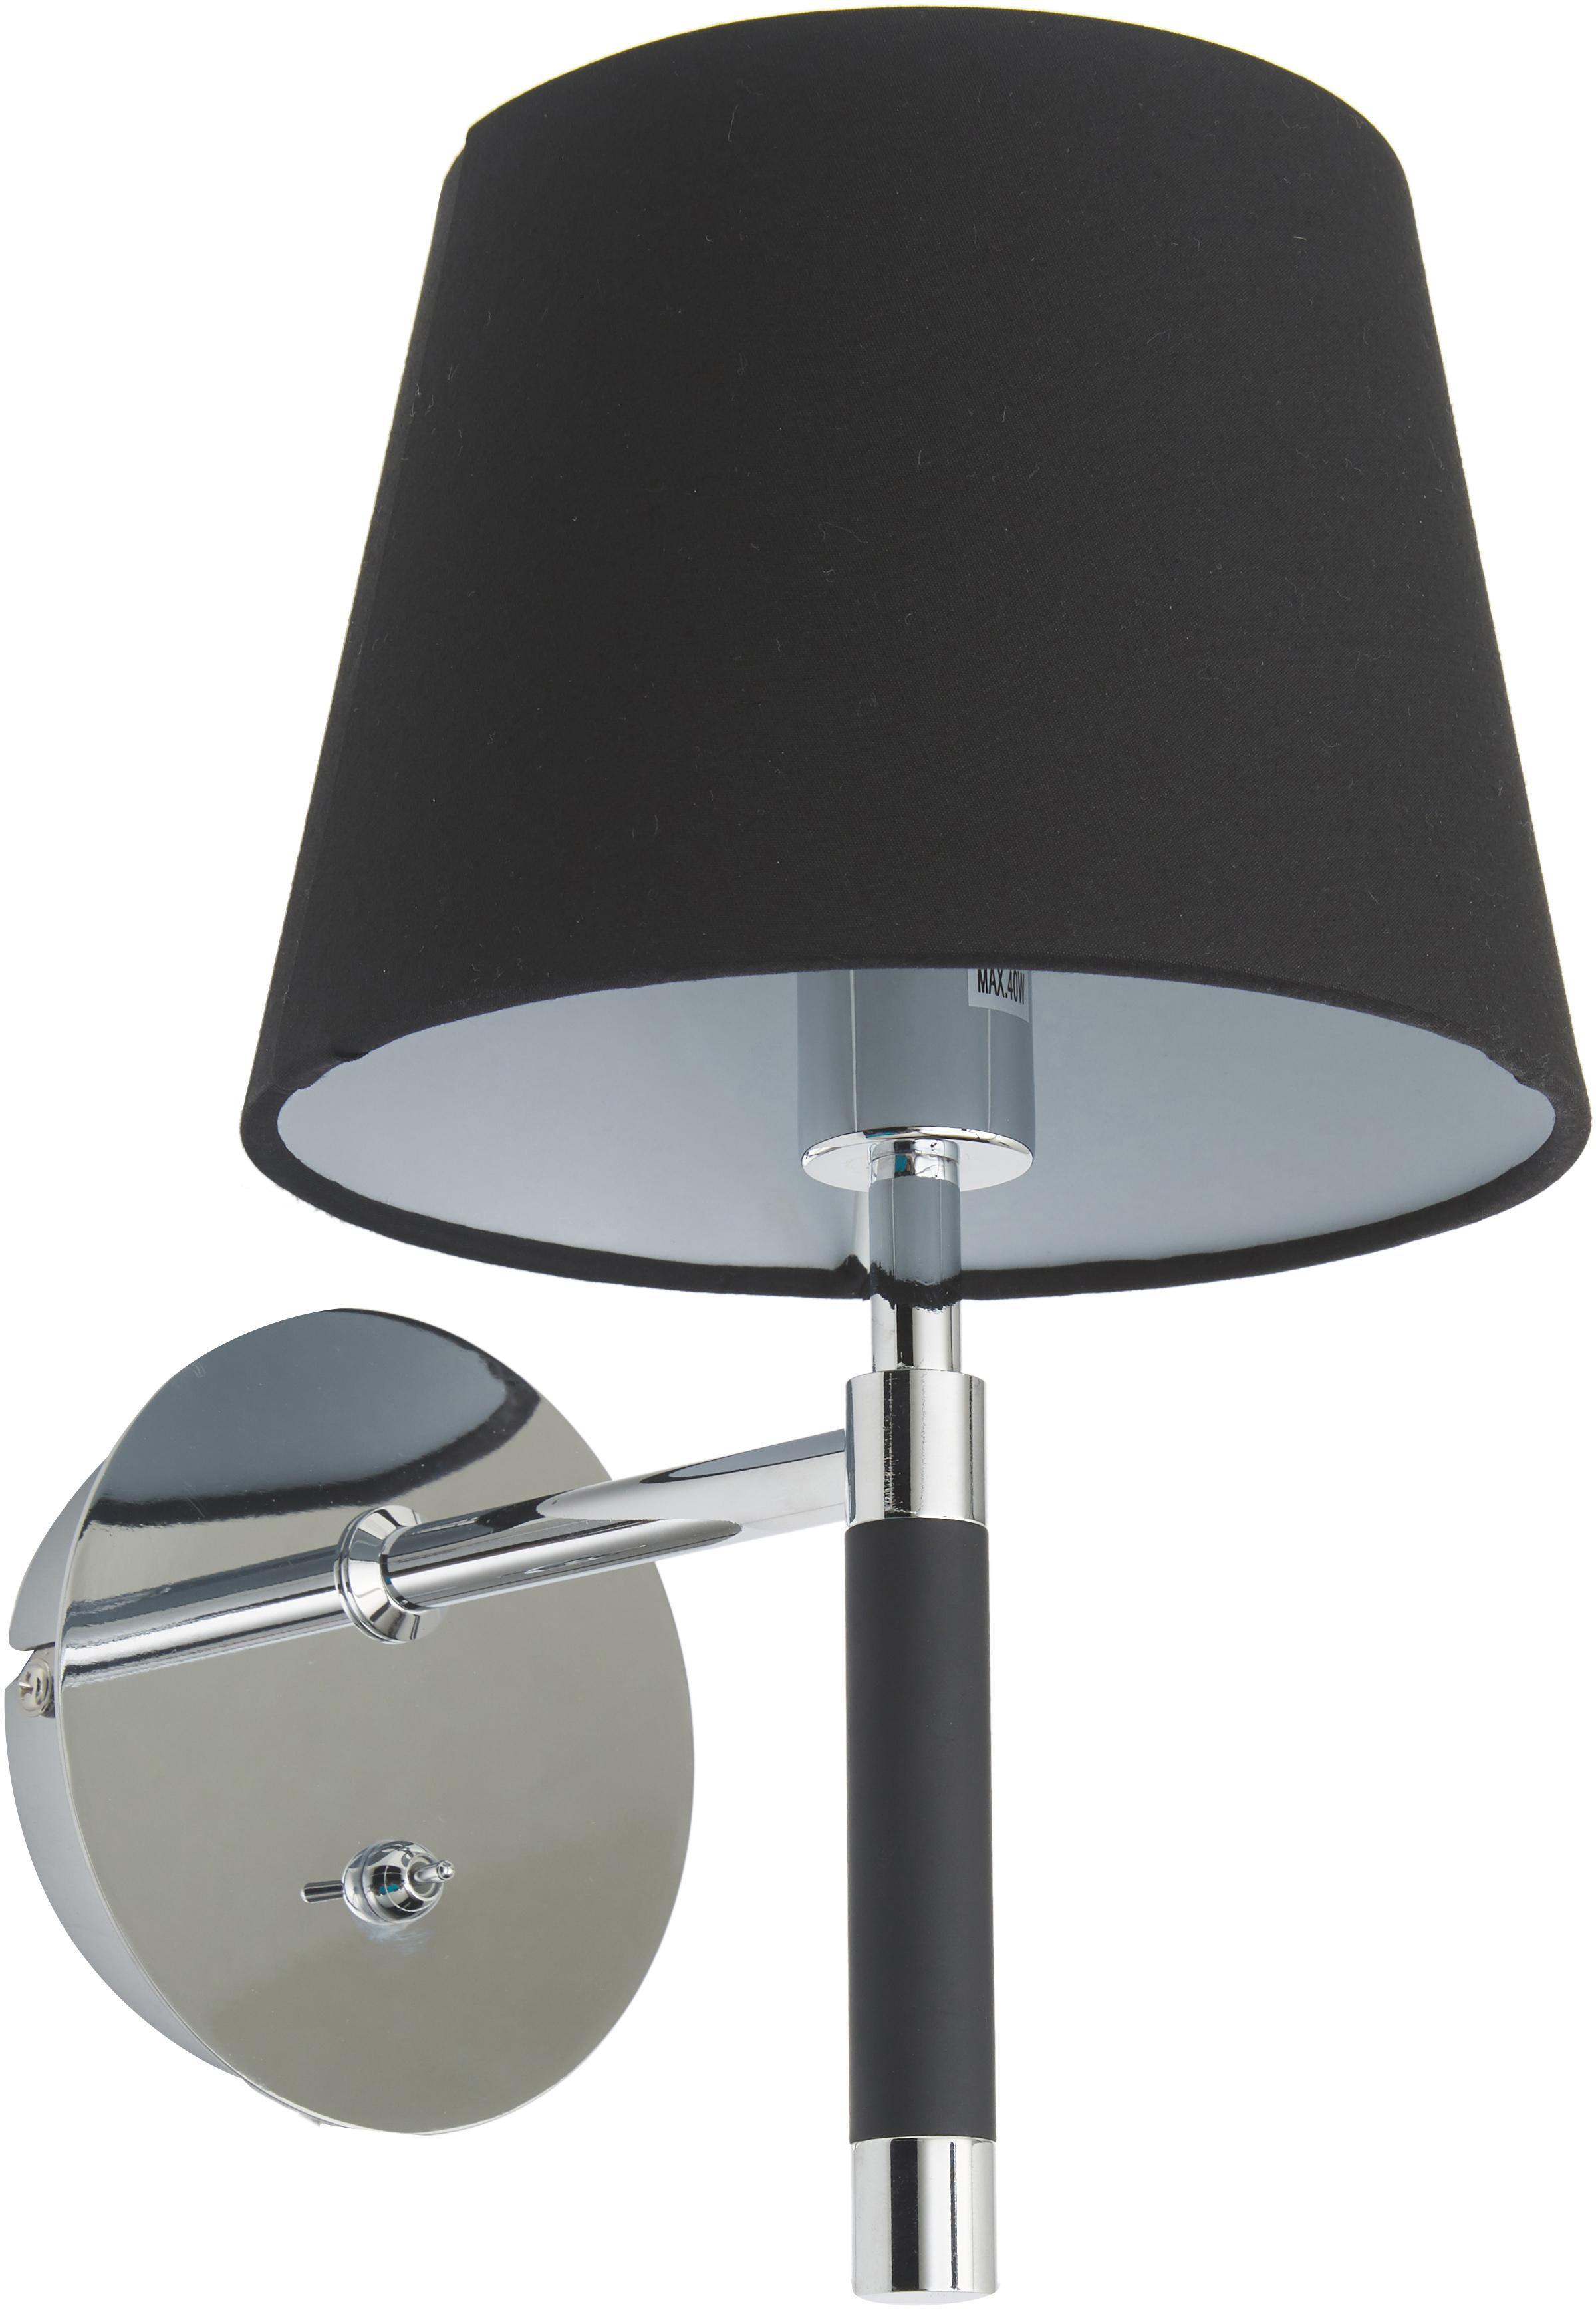 Wandlamp Strap met stekker, Lampenkap: textiel, Bevestiging: chroomkleurig, zwart. Lampenkap: zwart, 14 x 29 cm